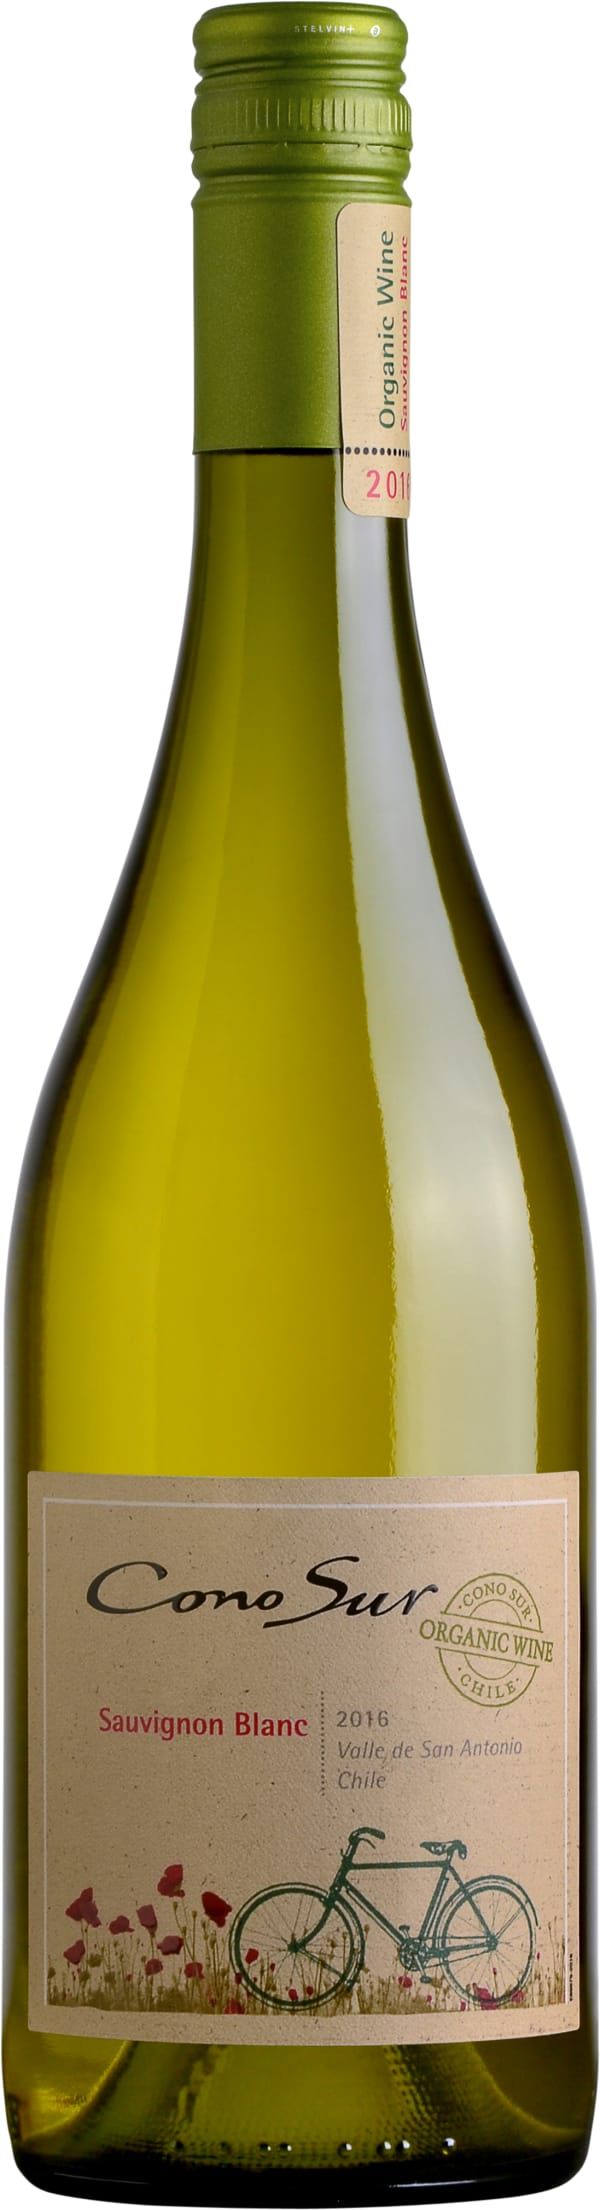 Cono Sur Organic Sauvignon Blanc 2017